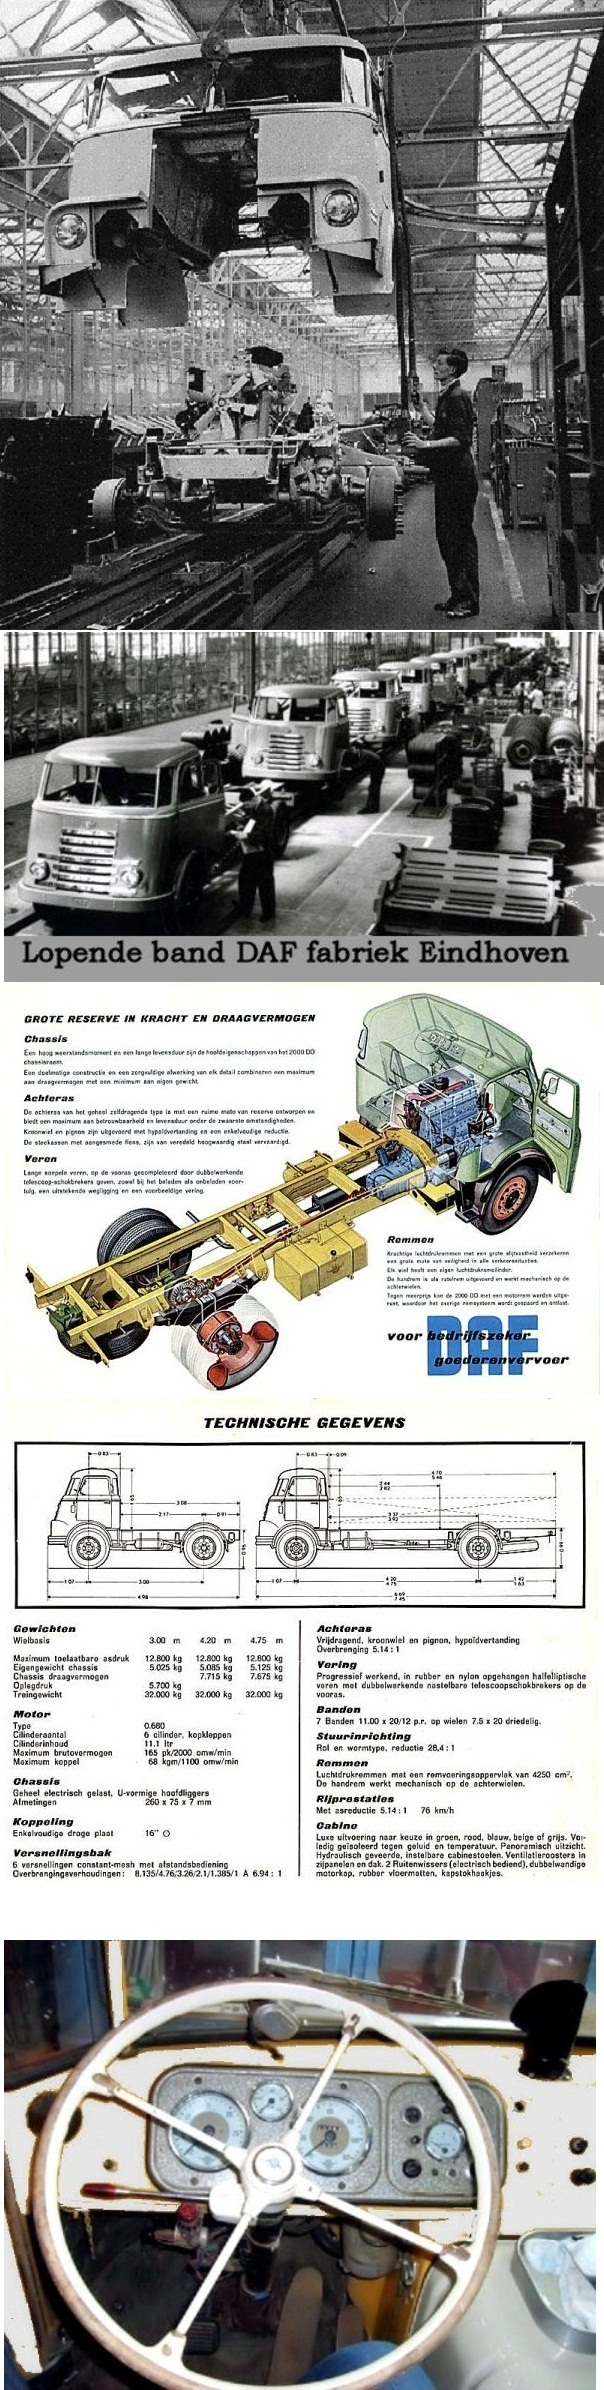 DAF Fabriek 1.jpeg